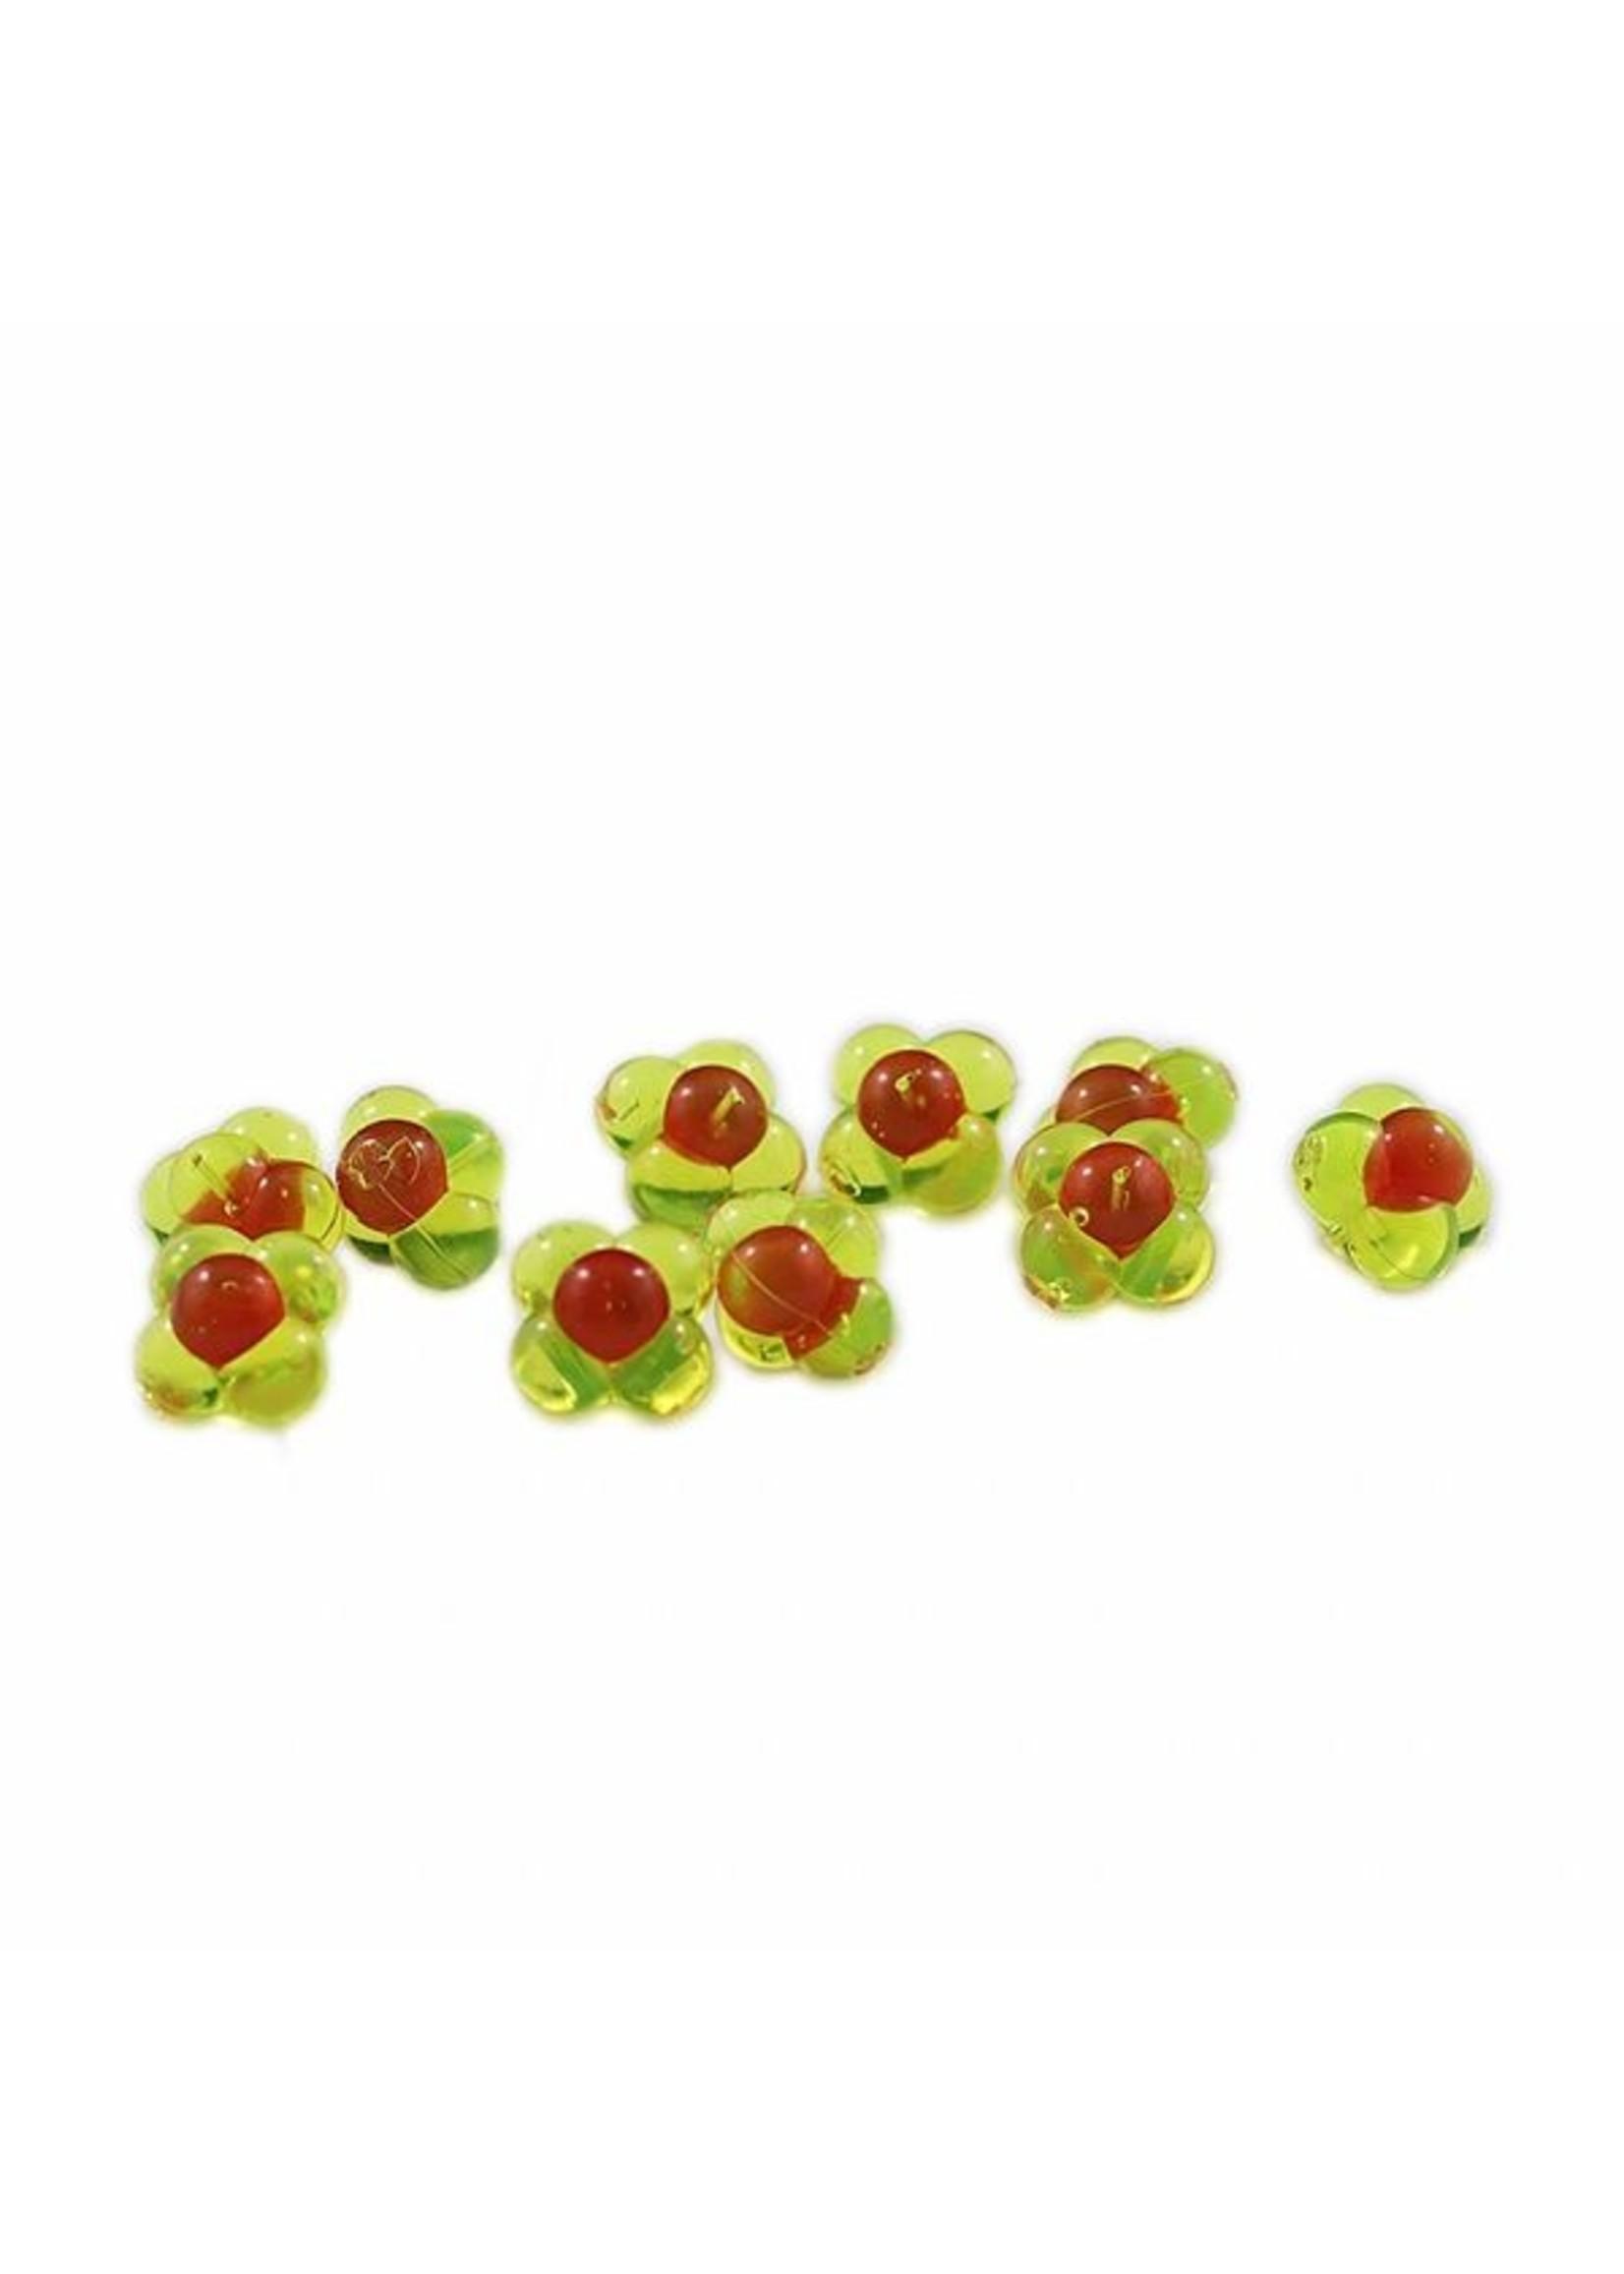 Cleardrift Cleardrift Embryo Egg Clusters Lg Chart w/Red Embryo